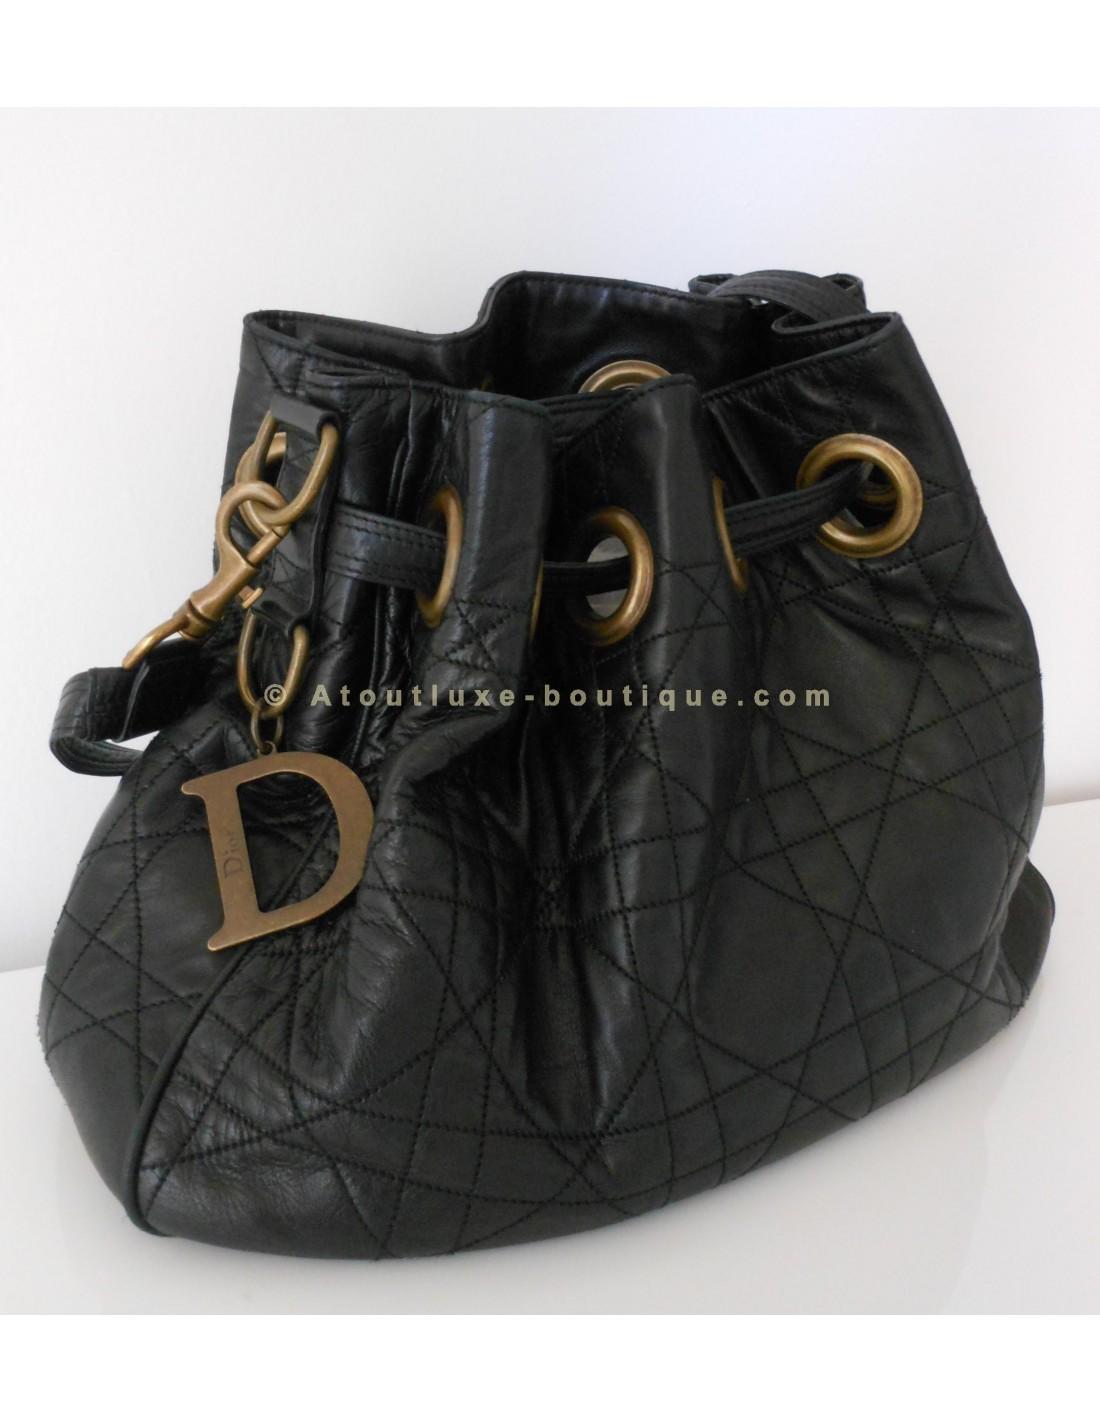 sac dior cannage cuir noir atoutluxe boutique. Black Bedroom Furniture Sets. Home Design Ideas